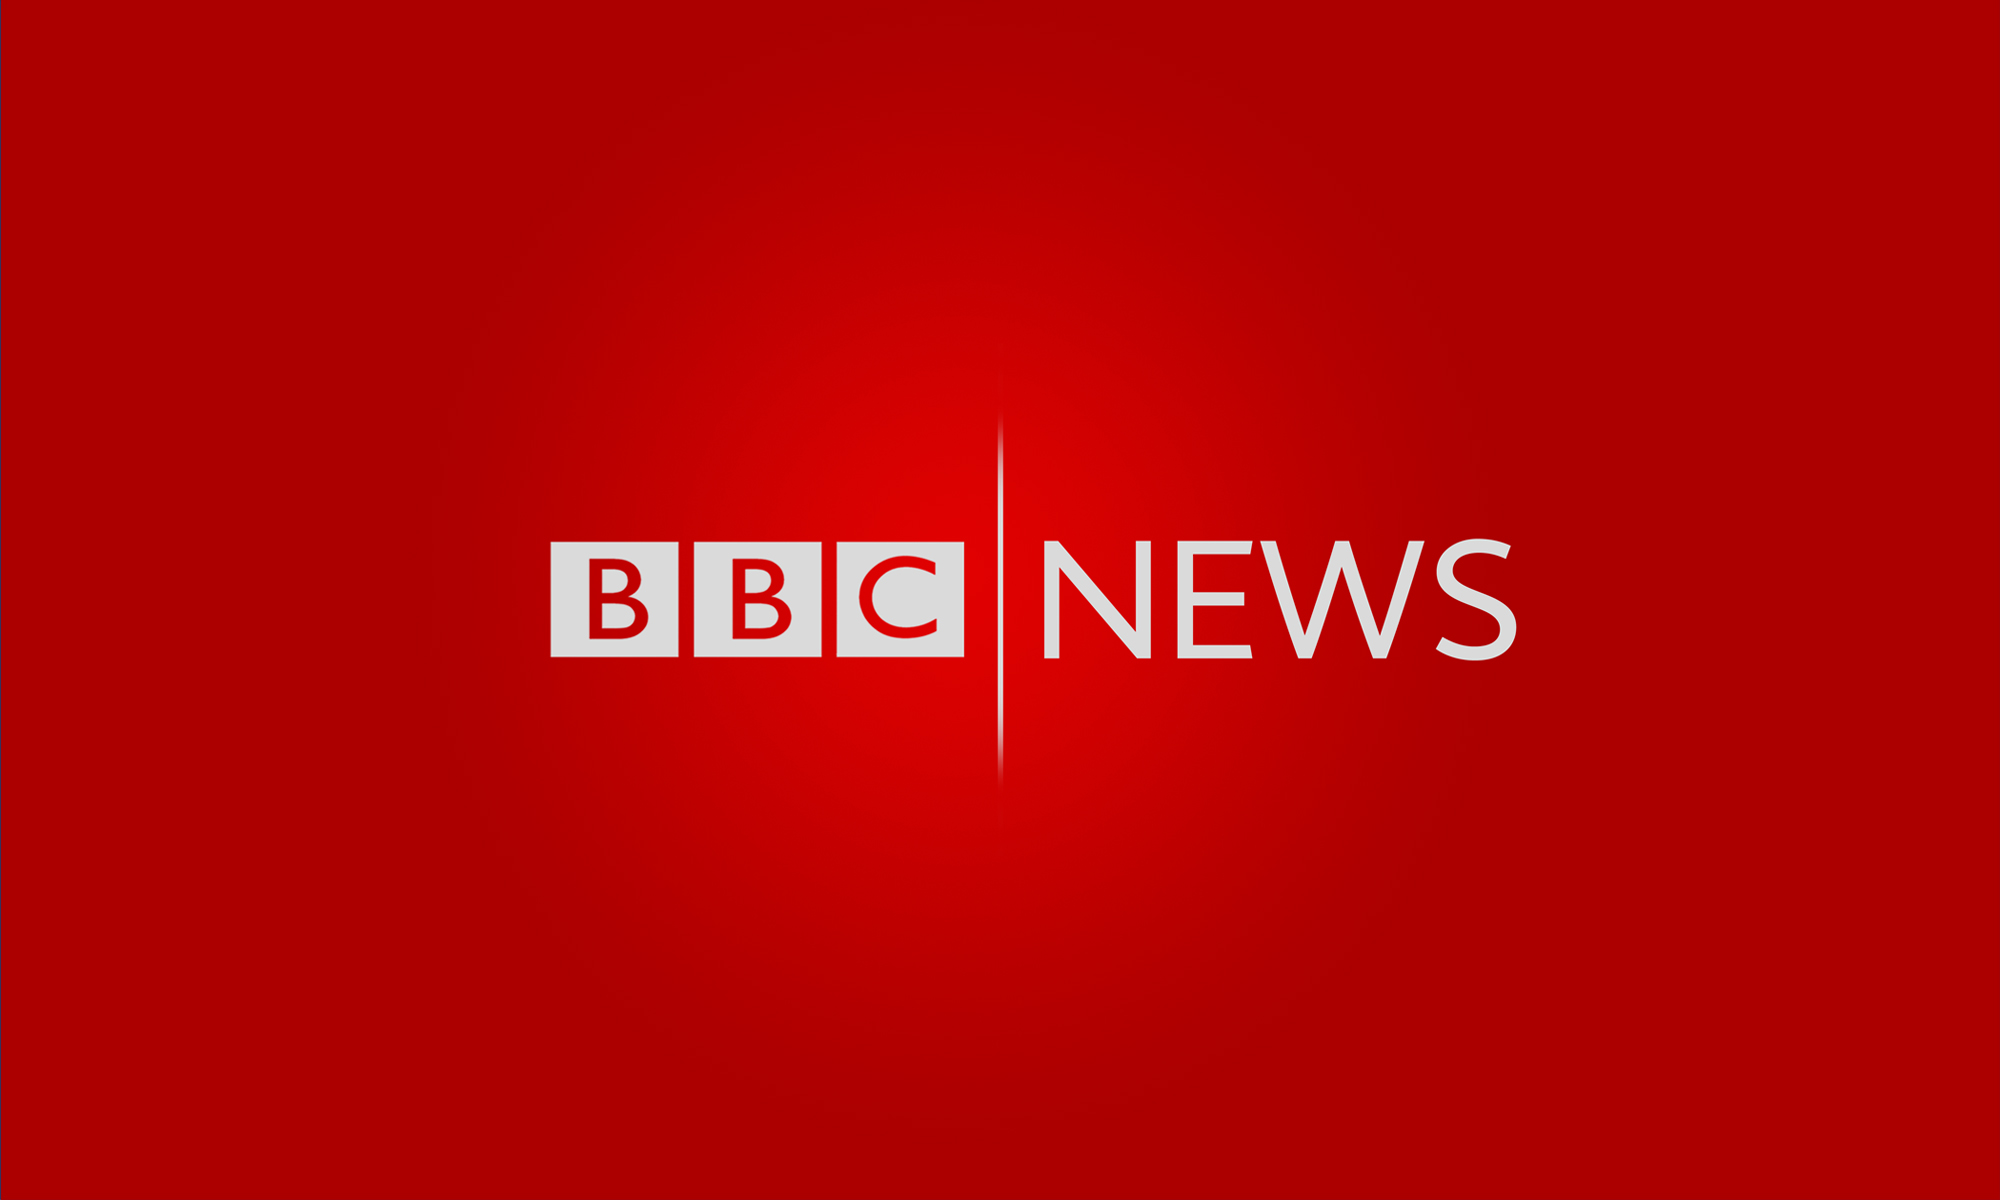 bbc01.jpg